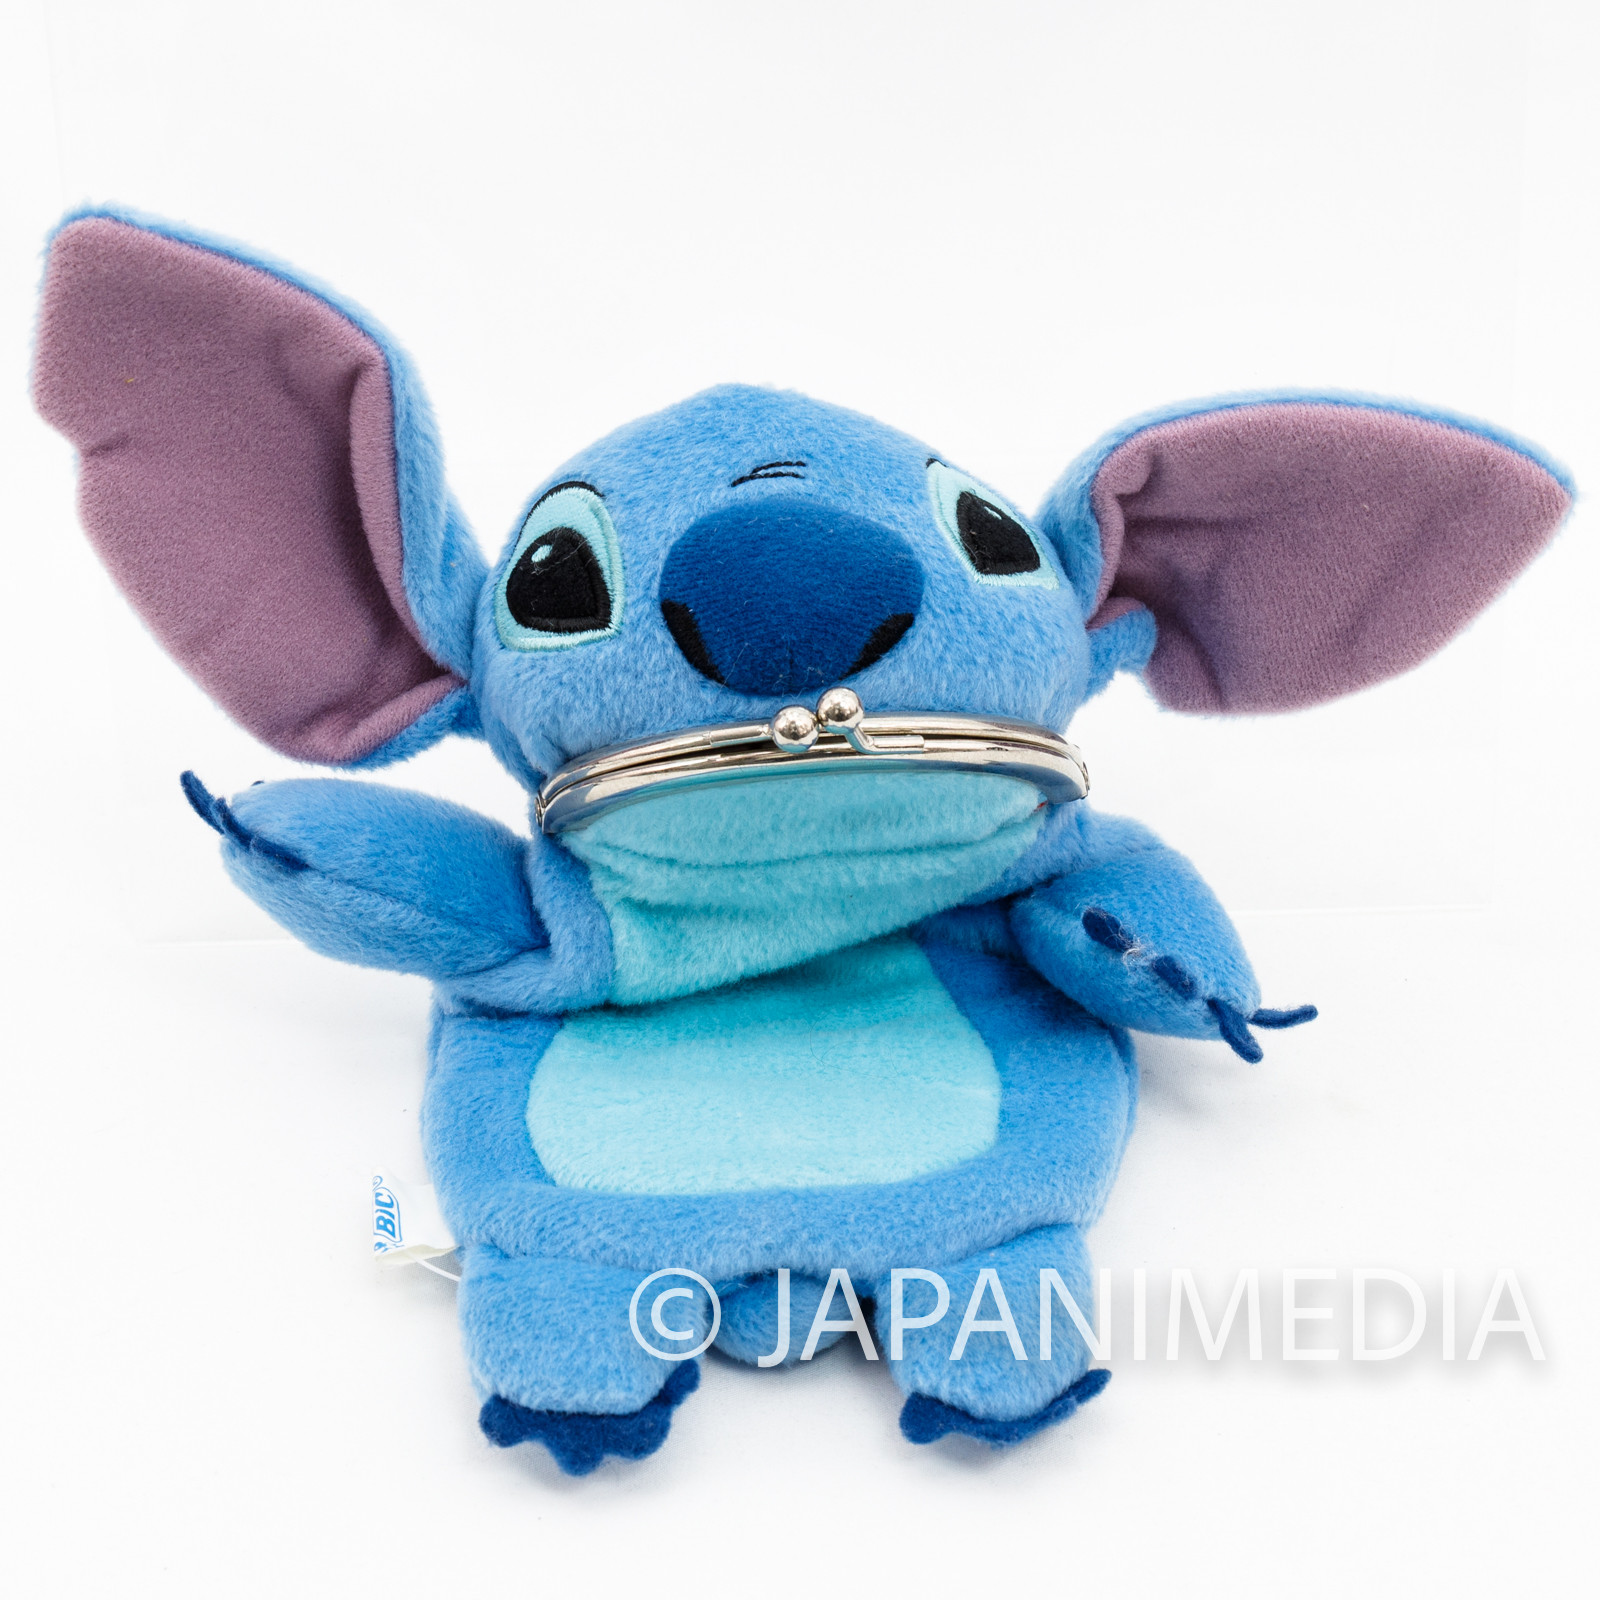 Stitch Plush type Gamaguchi Pen Case Disney